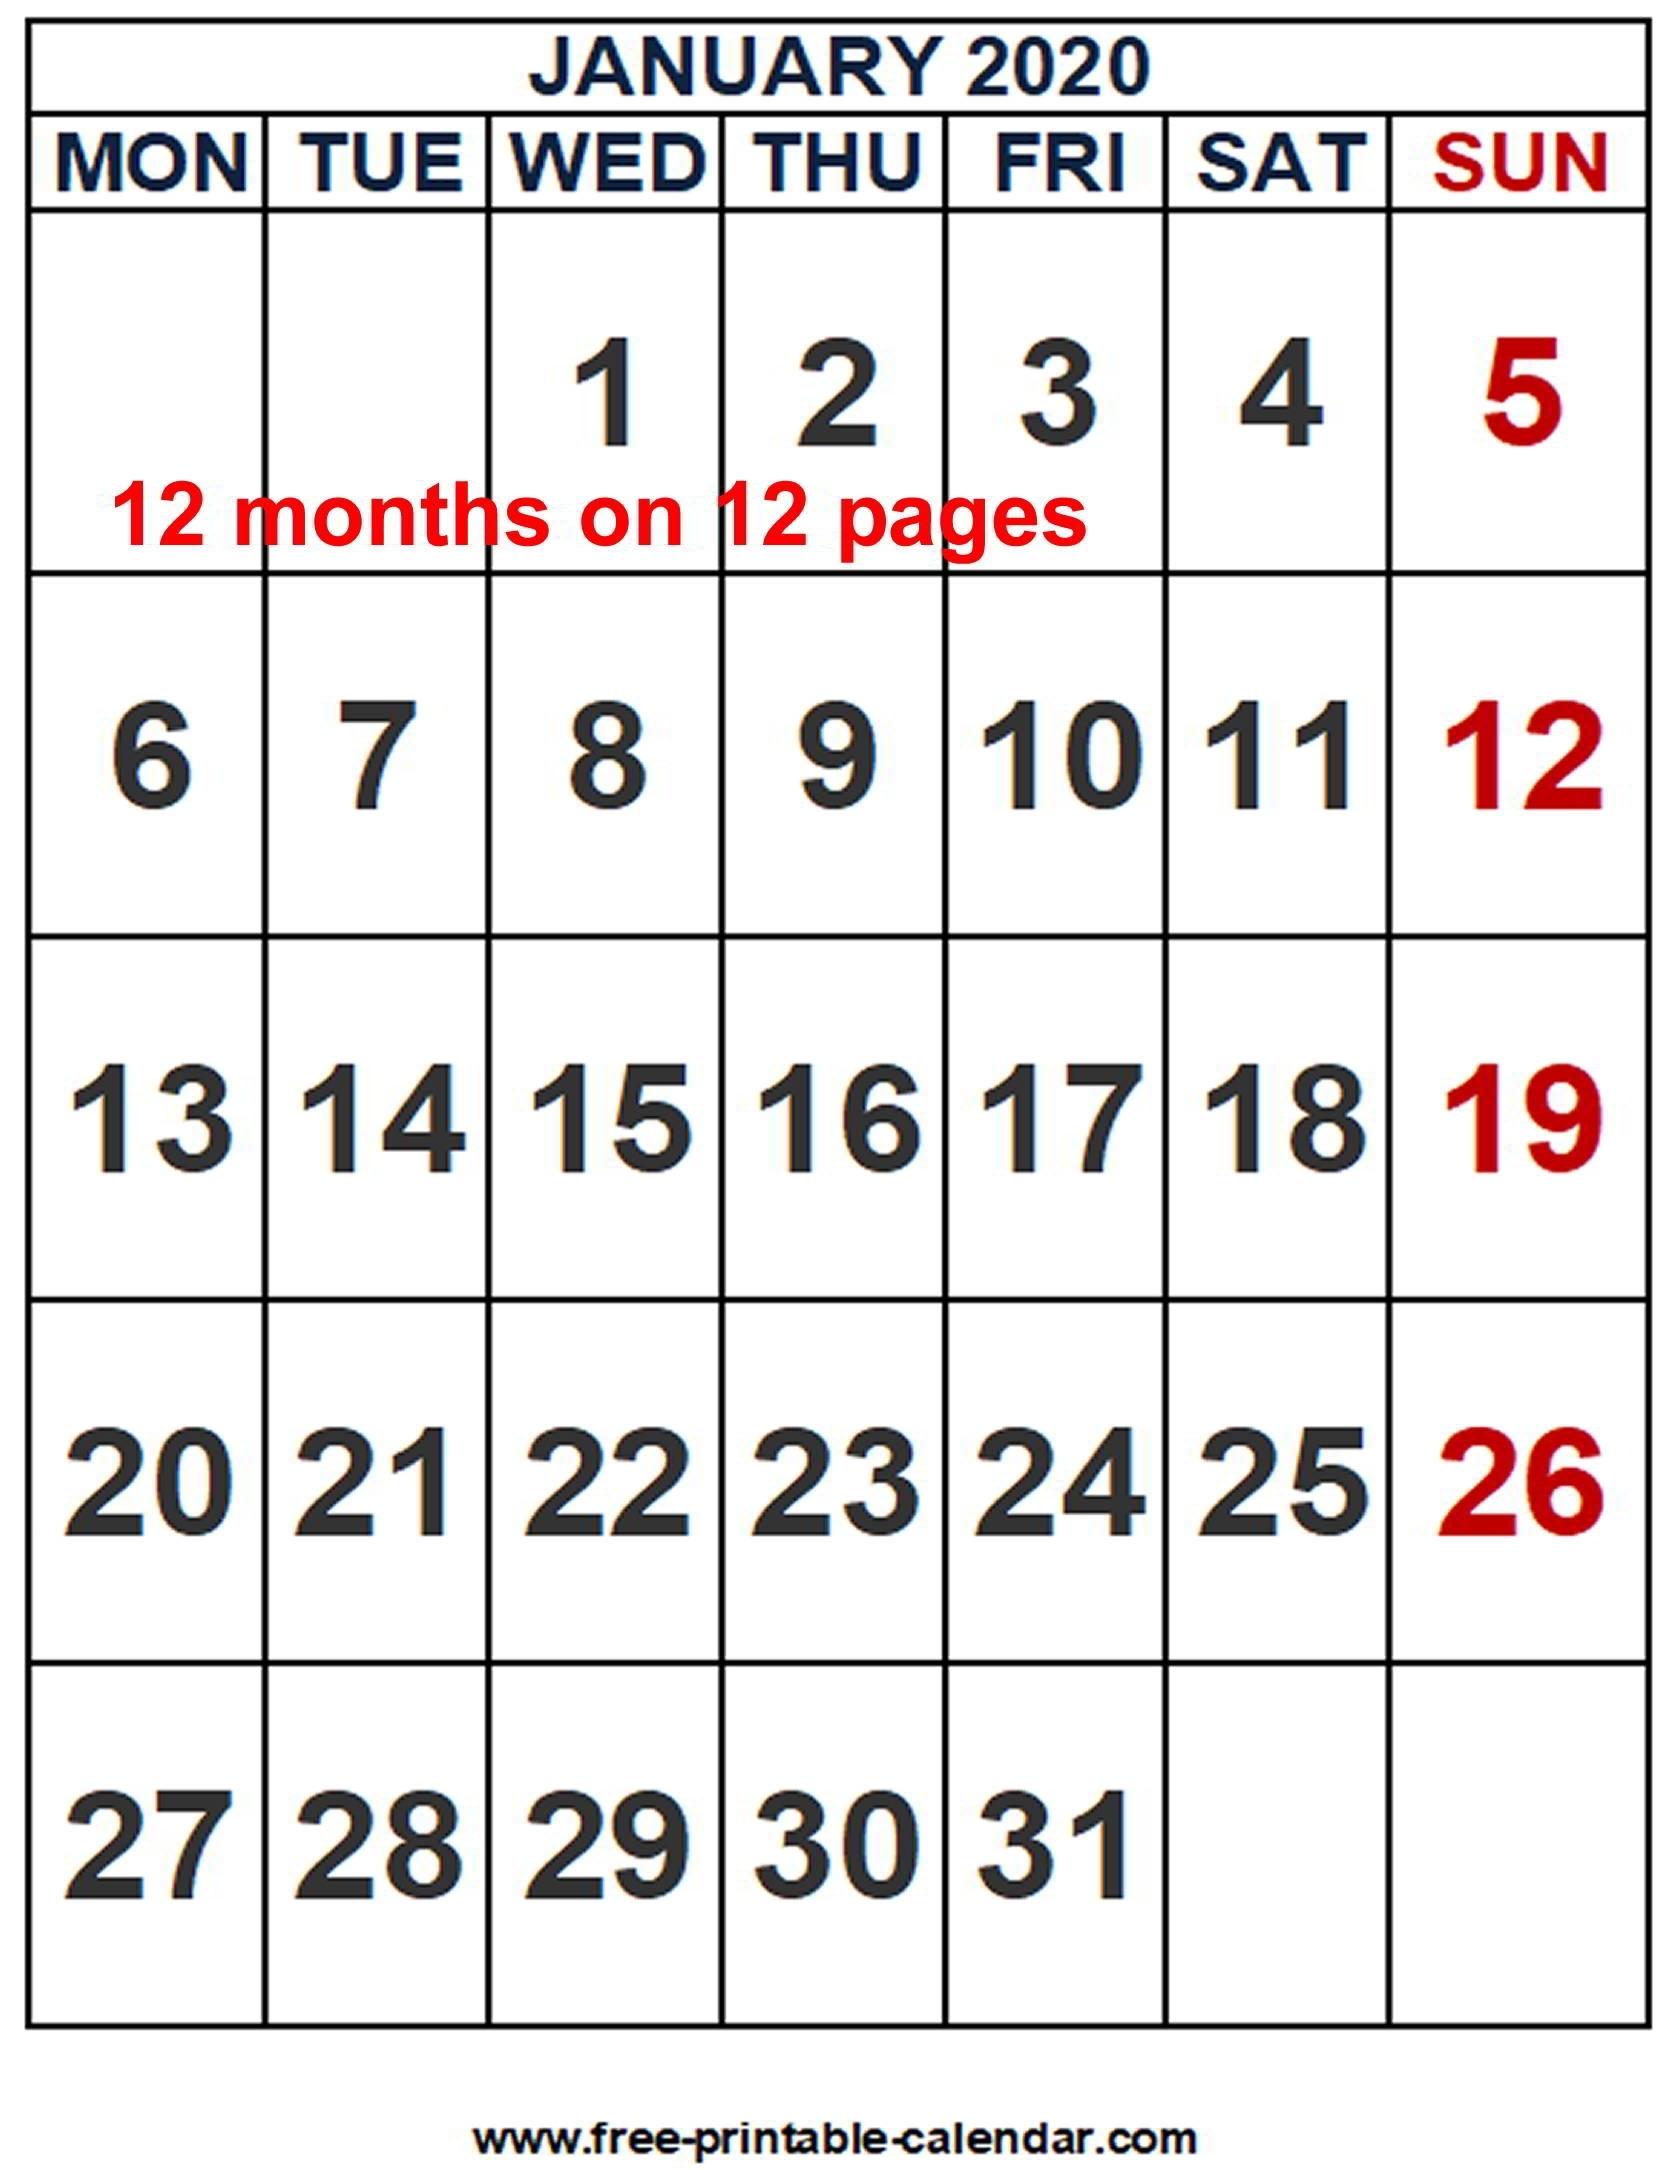 2020 Calendar Word Template - Free-Printable-Calendar throughout 2020 Calendar Printable Free Word Monthly